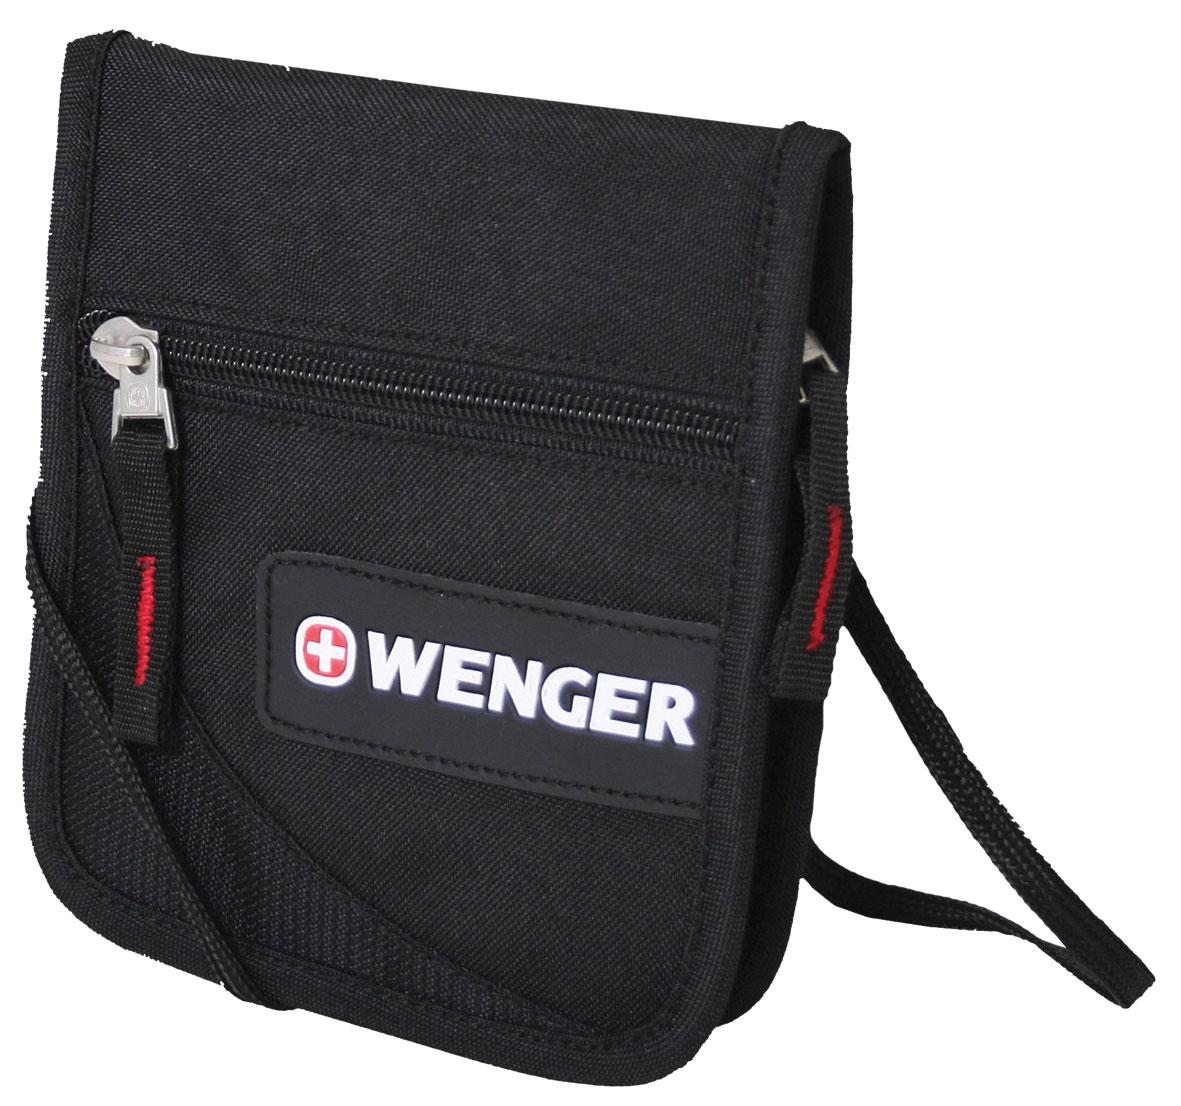 Кошелёк на шею WENGER, черный, полиэстер 600D, 14х2х16 см